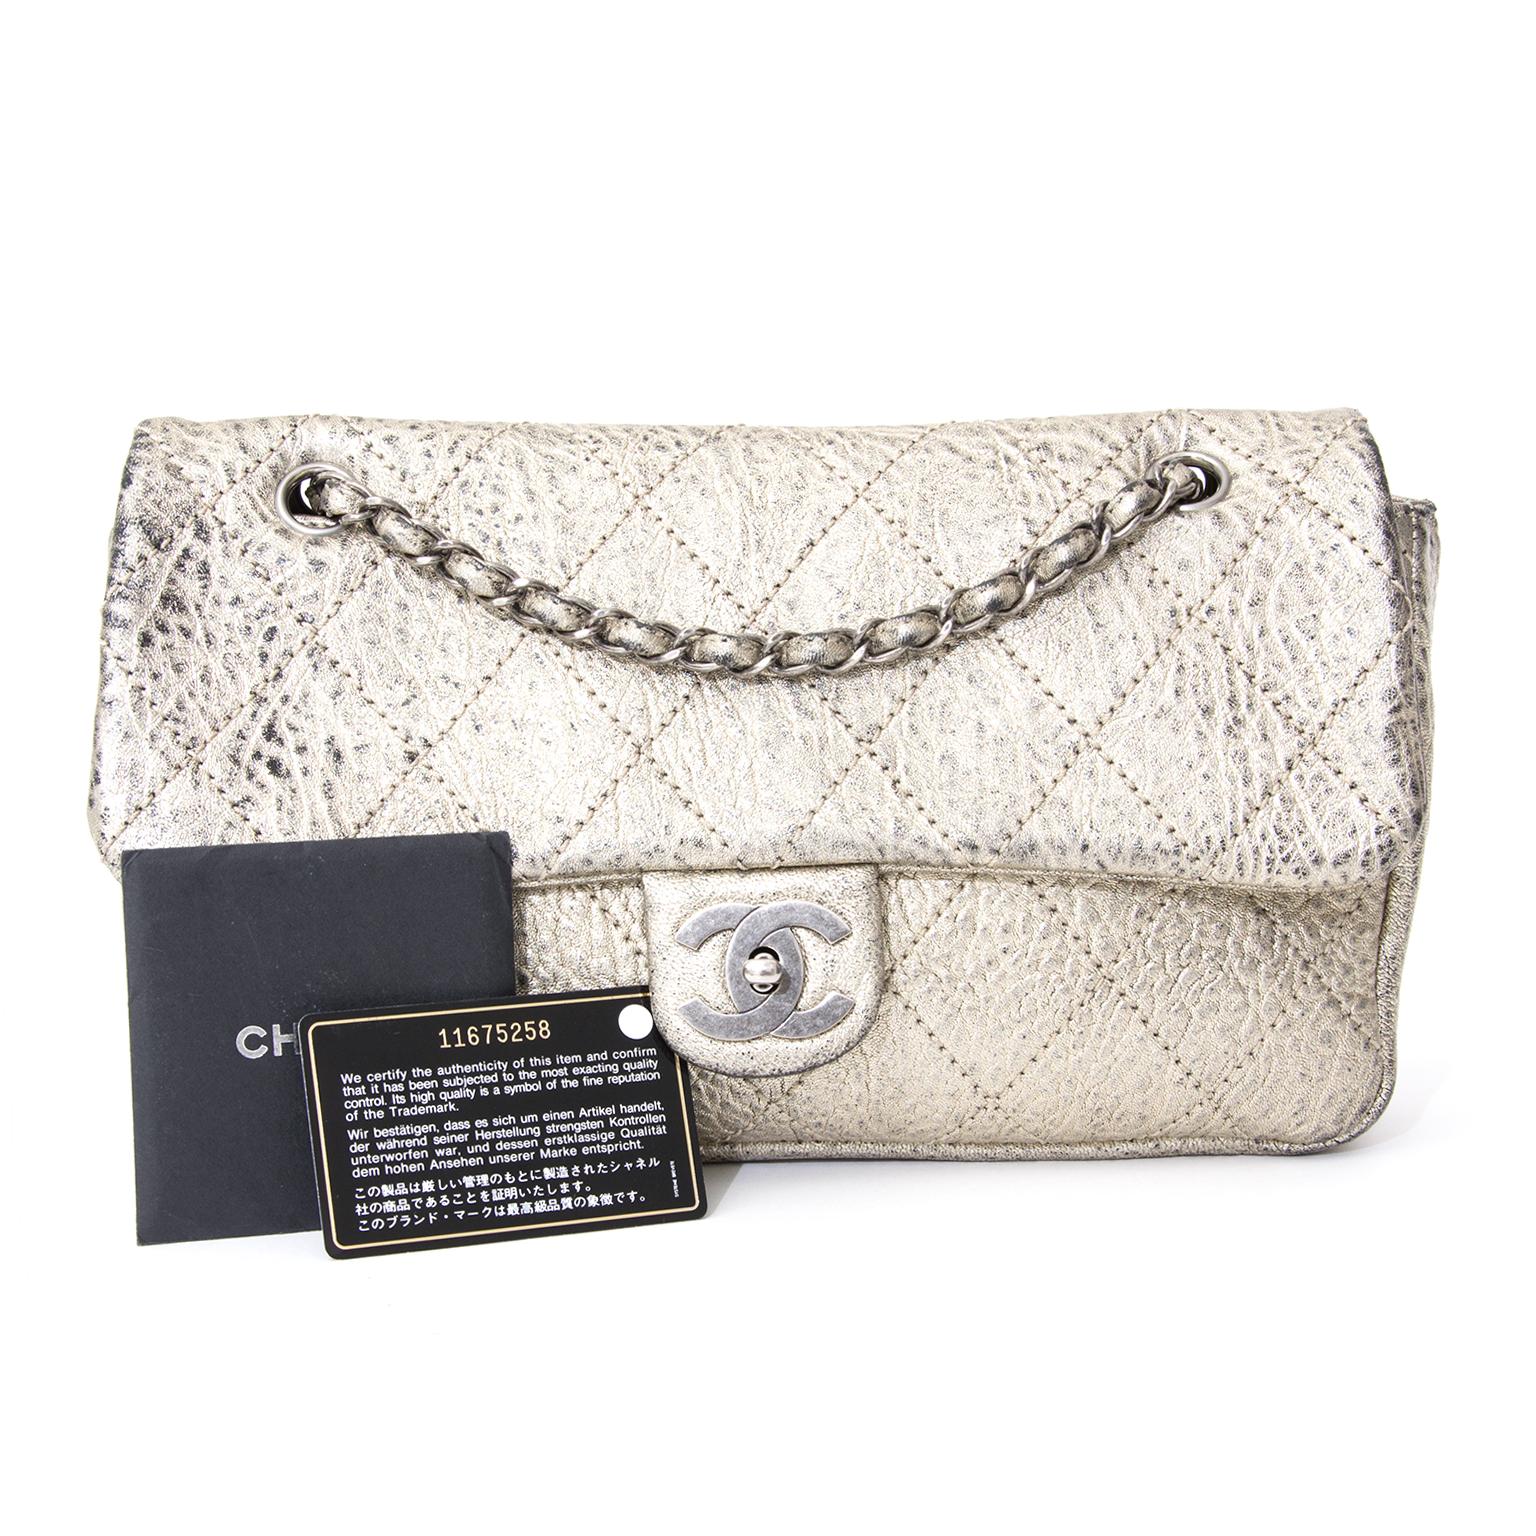 9f59f23b6c26 buy safe online secondhand designer Rare Chanel Aged Silver Classic Flap Bag  like new koop veilig online tweedehands chanel Rare Chanel Aged Silver  Classic ...